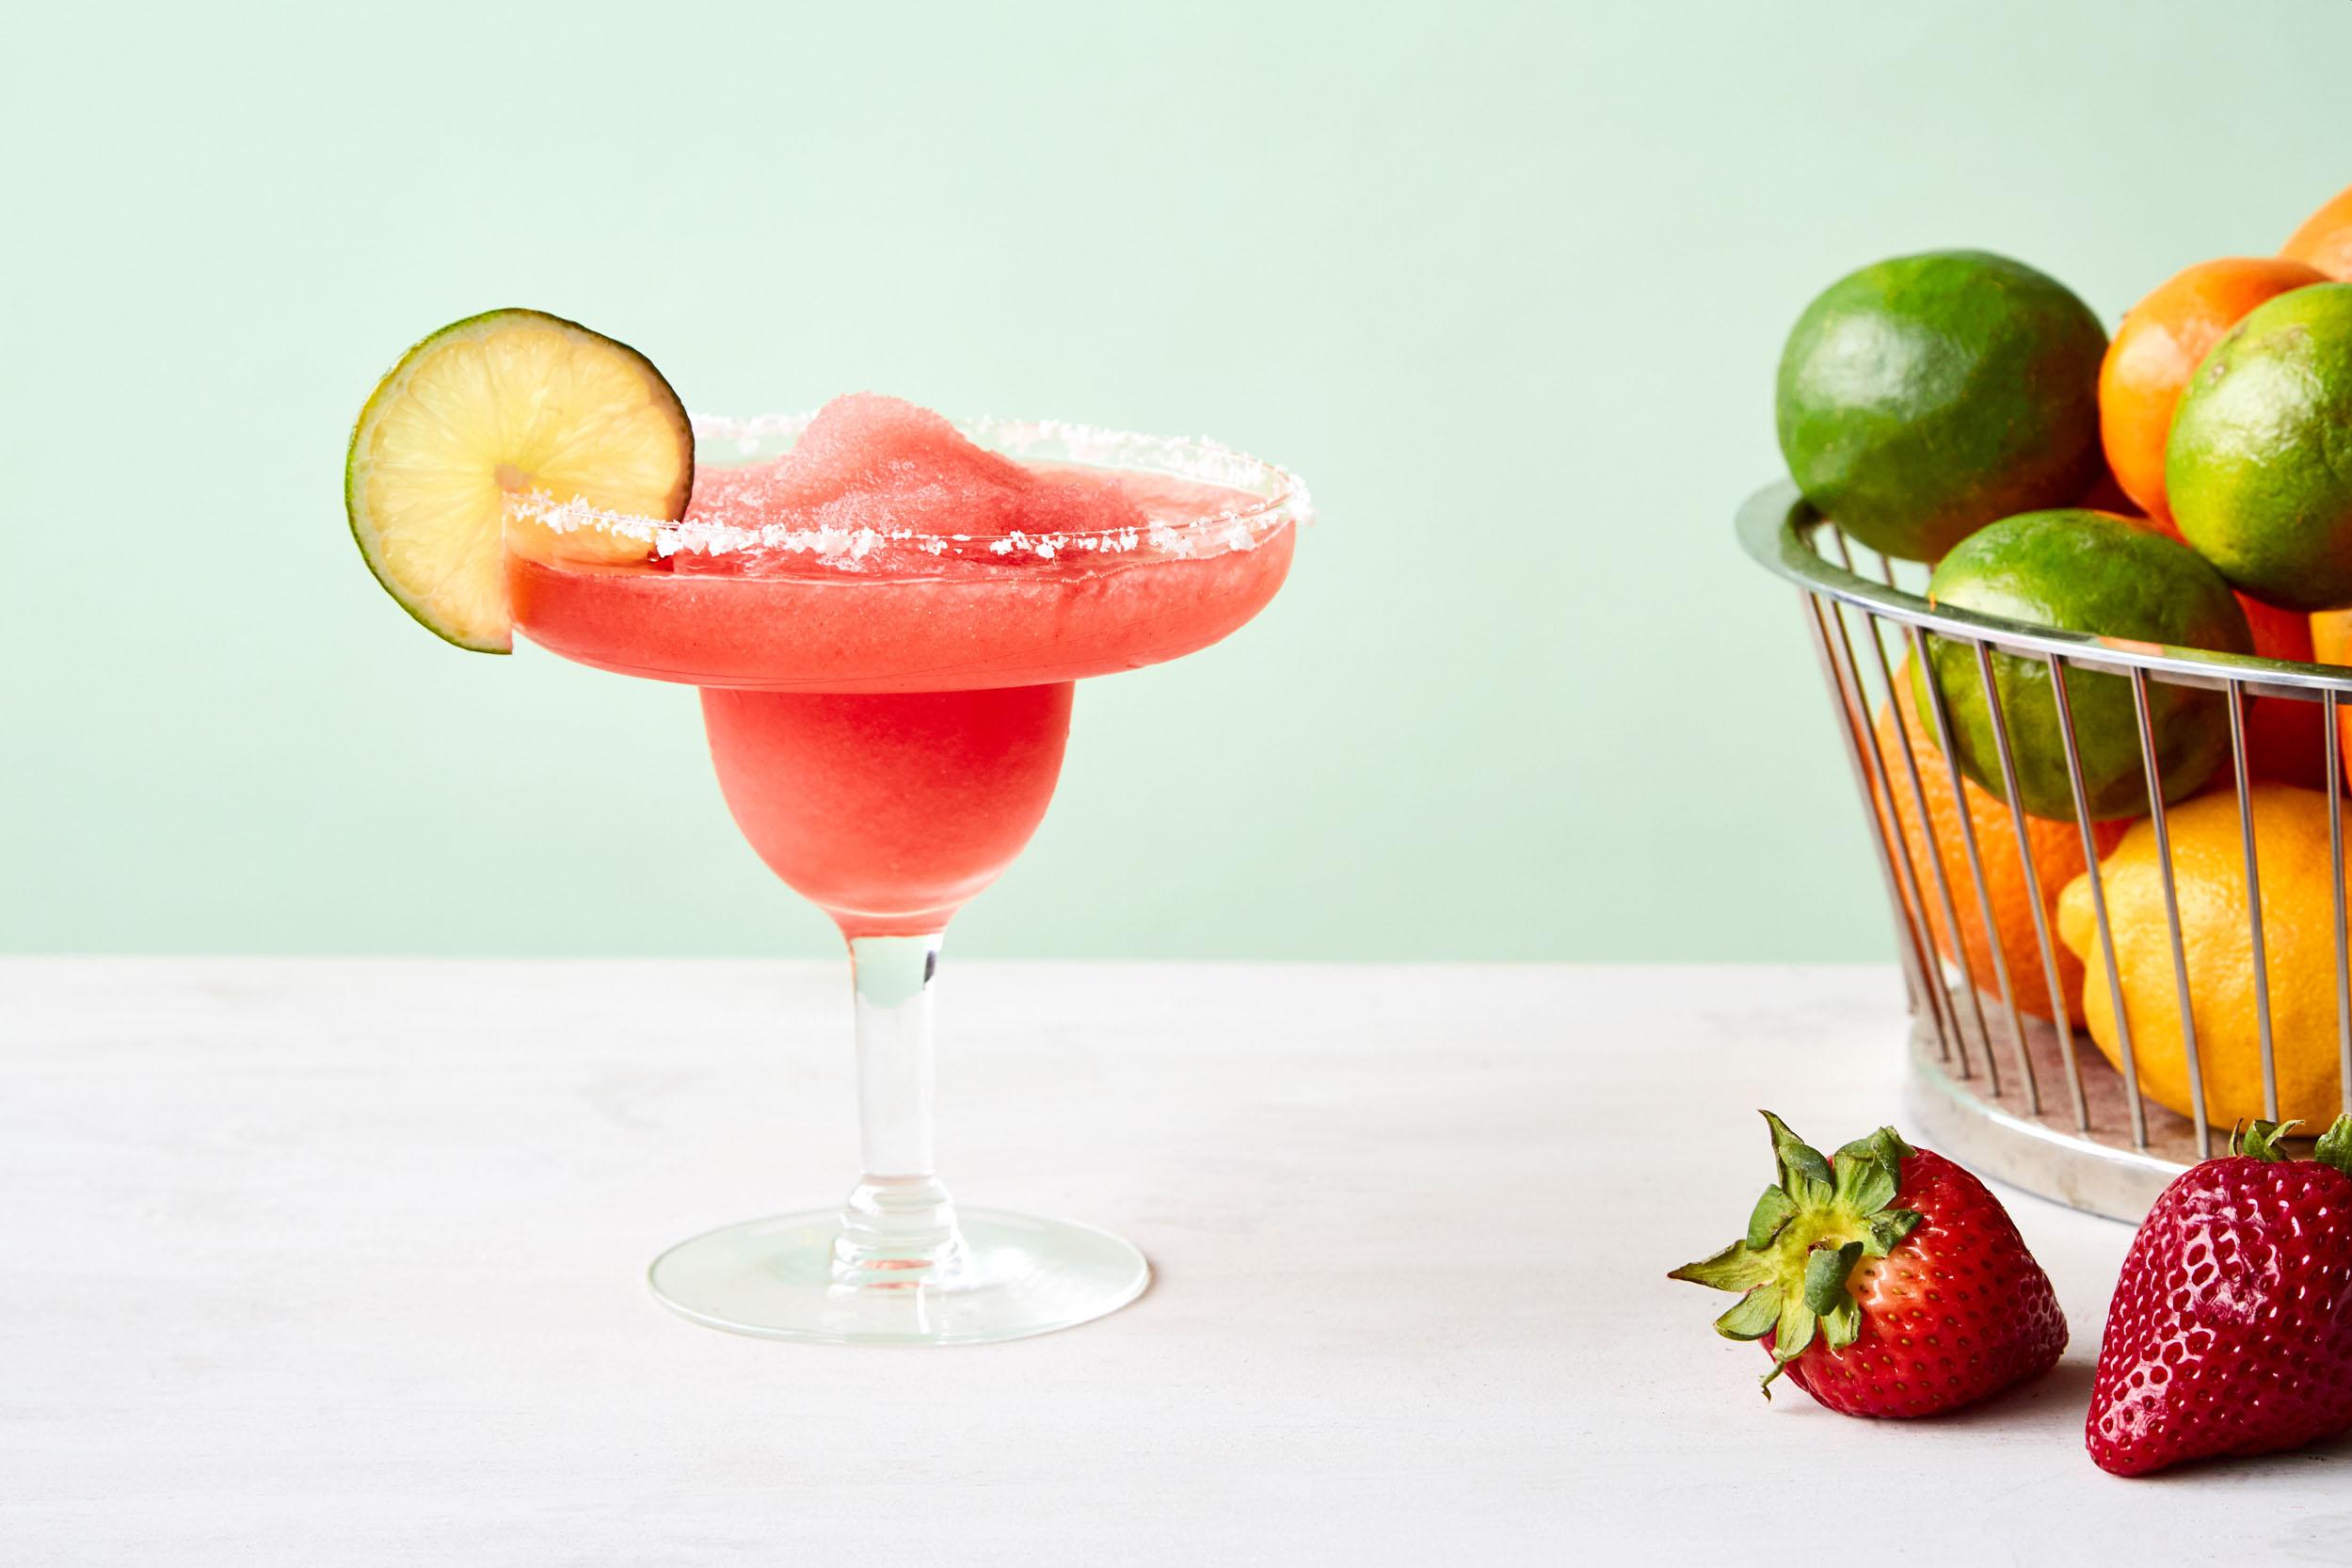 strawberry margarita - Kelvin Margarita & Frosé Slush Mix,Tequila, Strawberry Purée